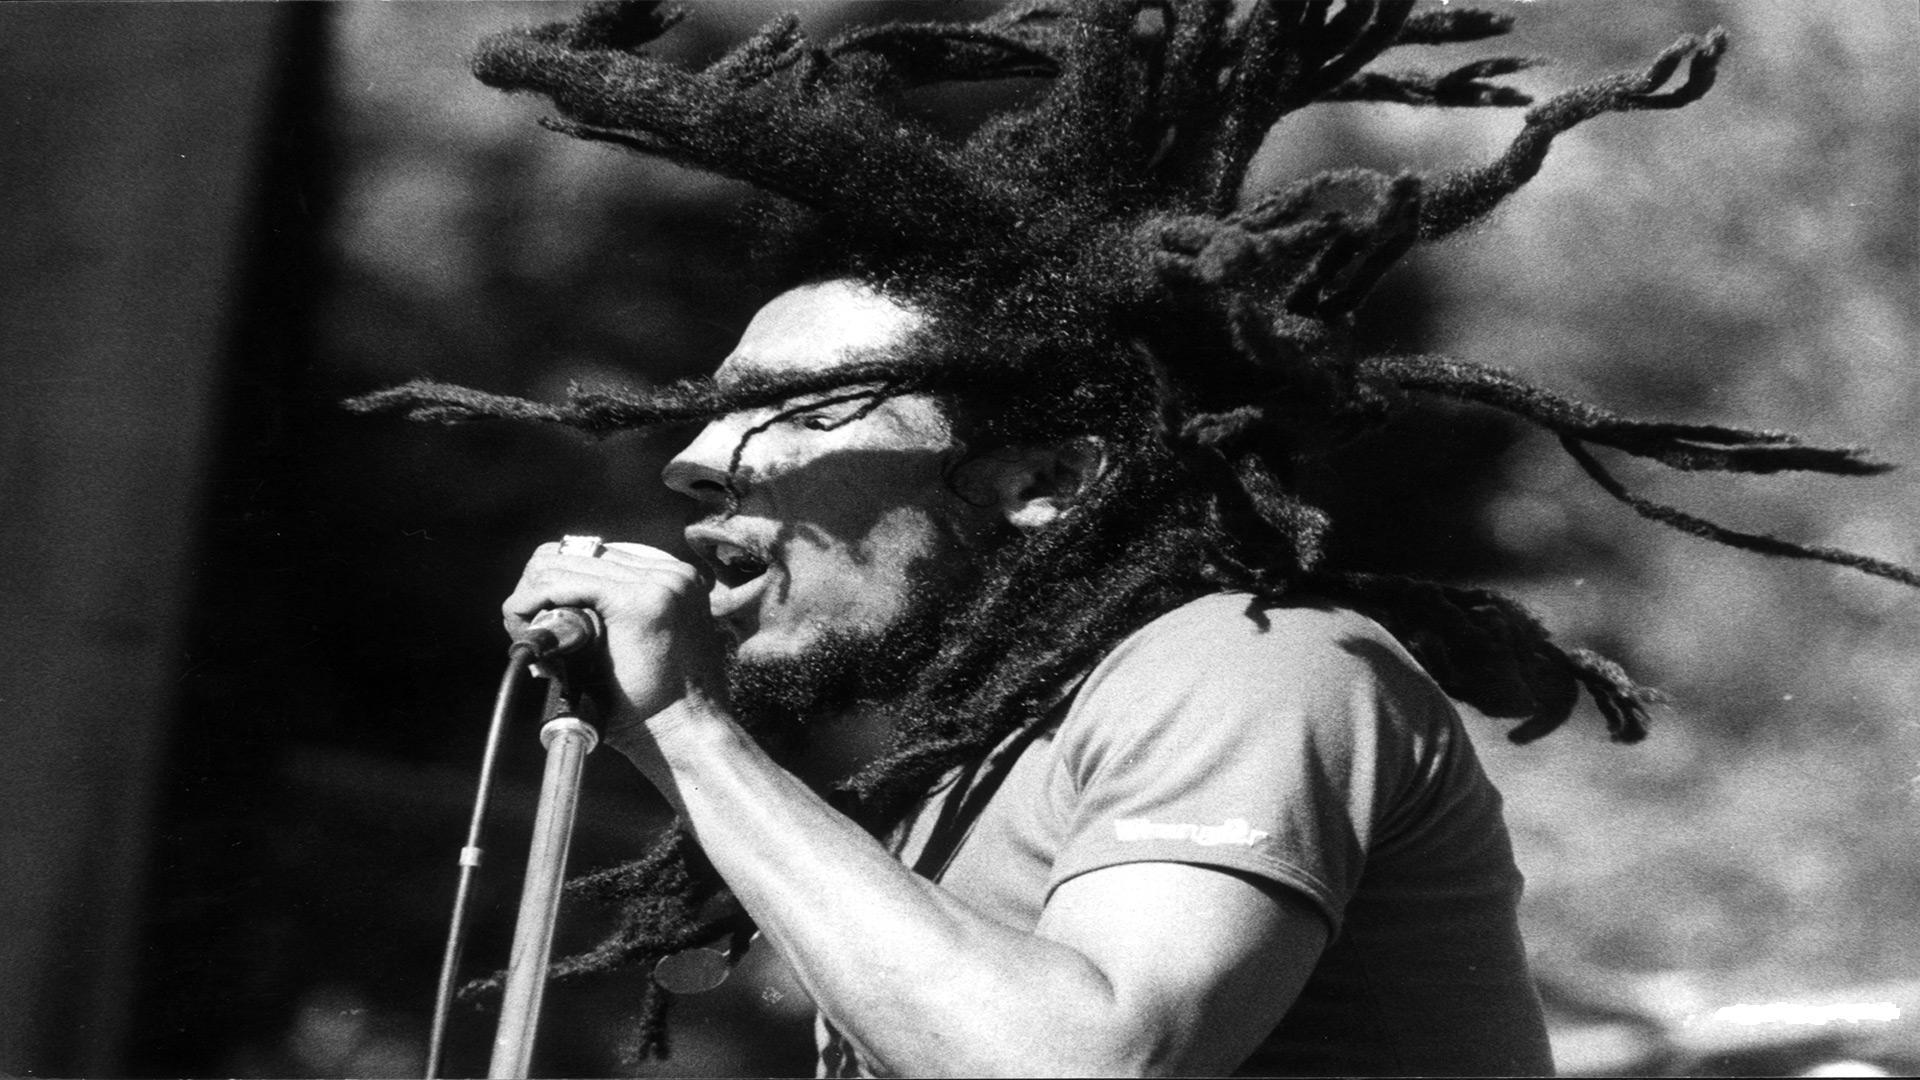 Download wallpaper 1920x1080 bob marley dreadlocks microphone action concert full hd 1080p - Reggae girl wallpaper ...